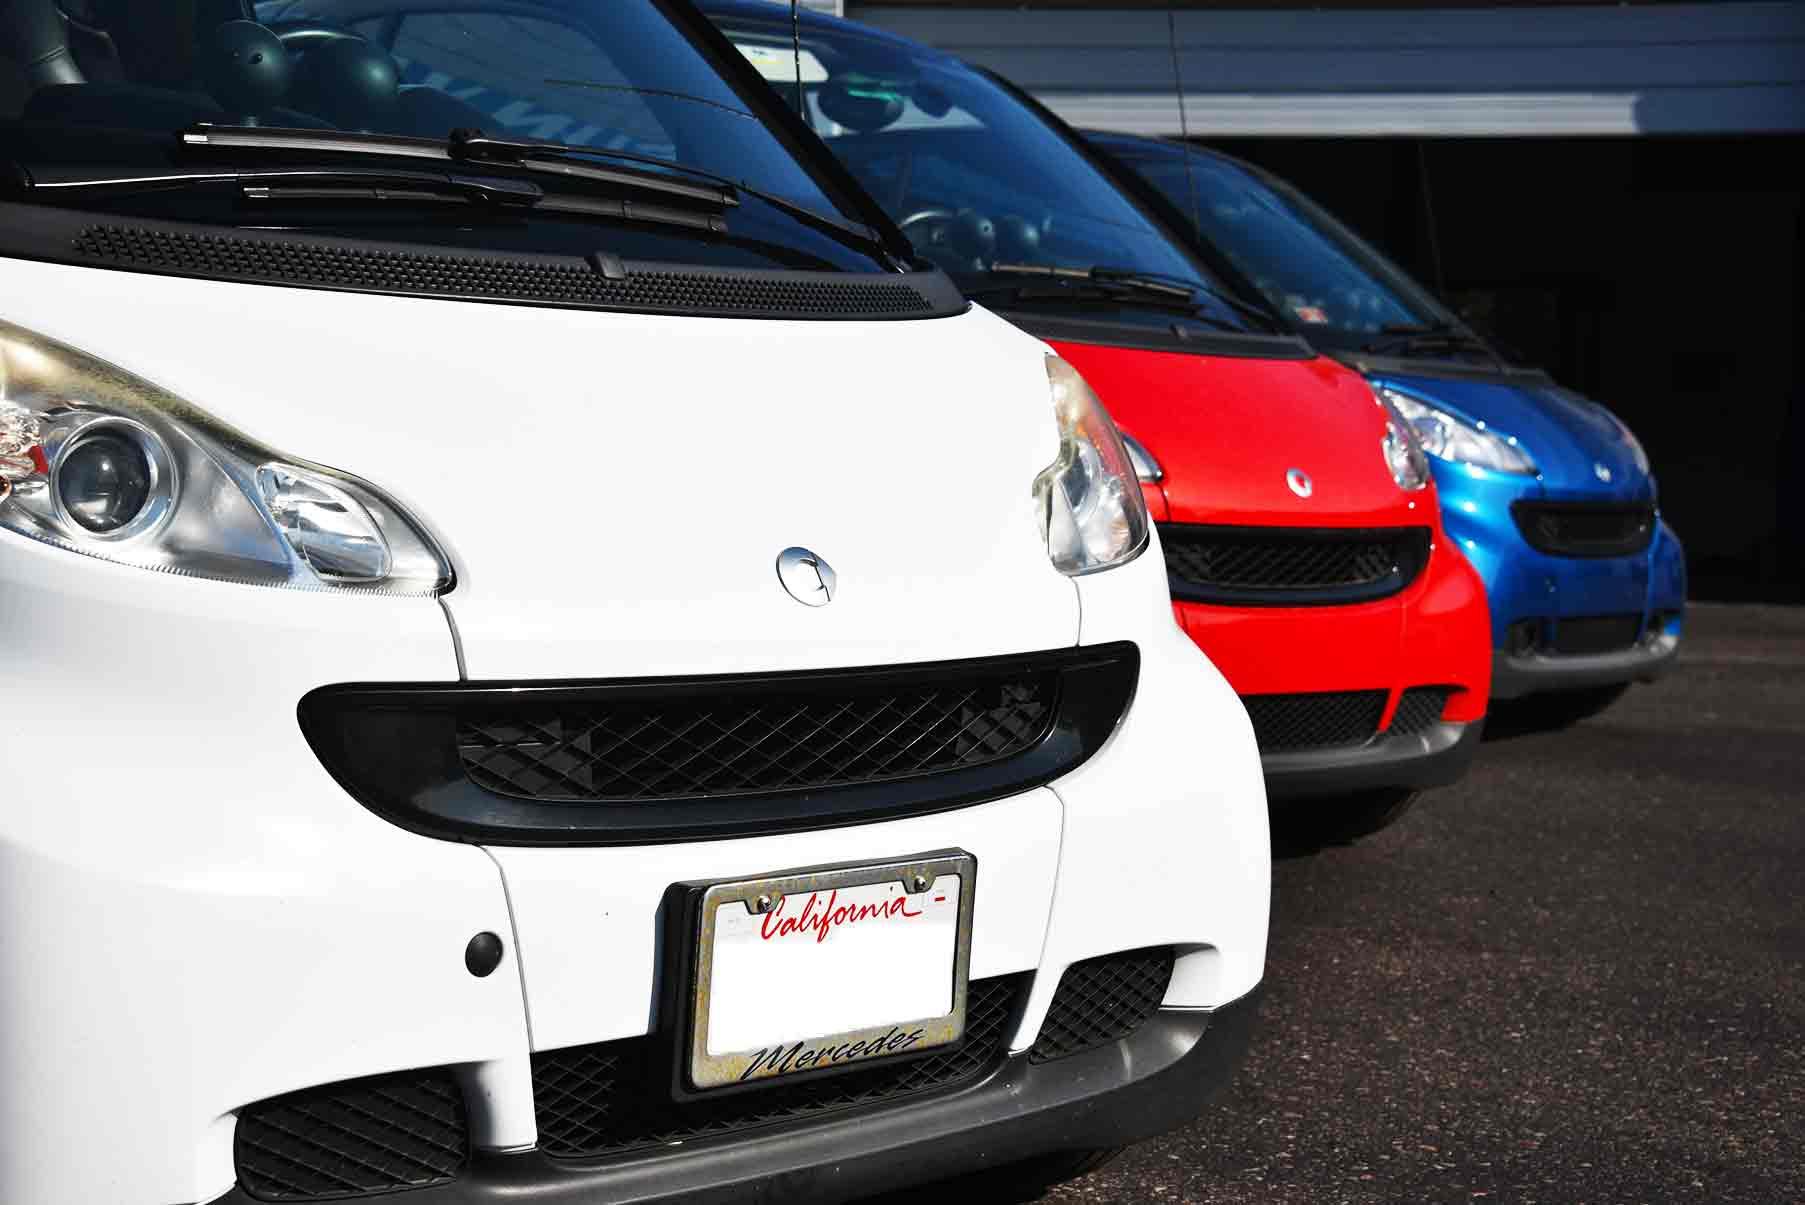 Smart car Image 1